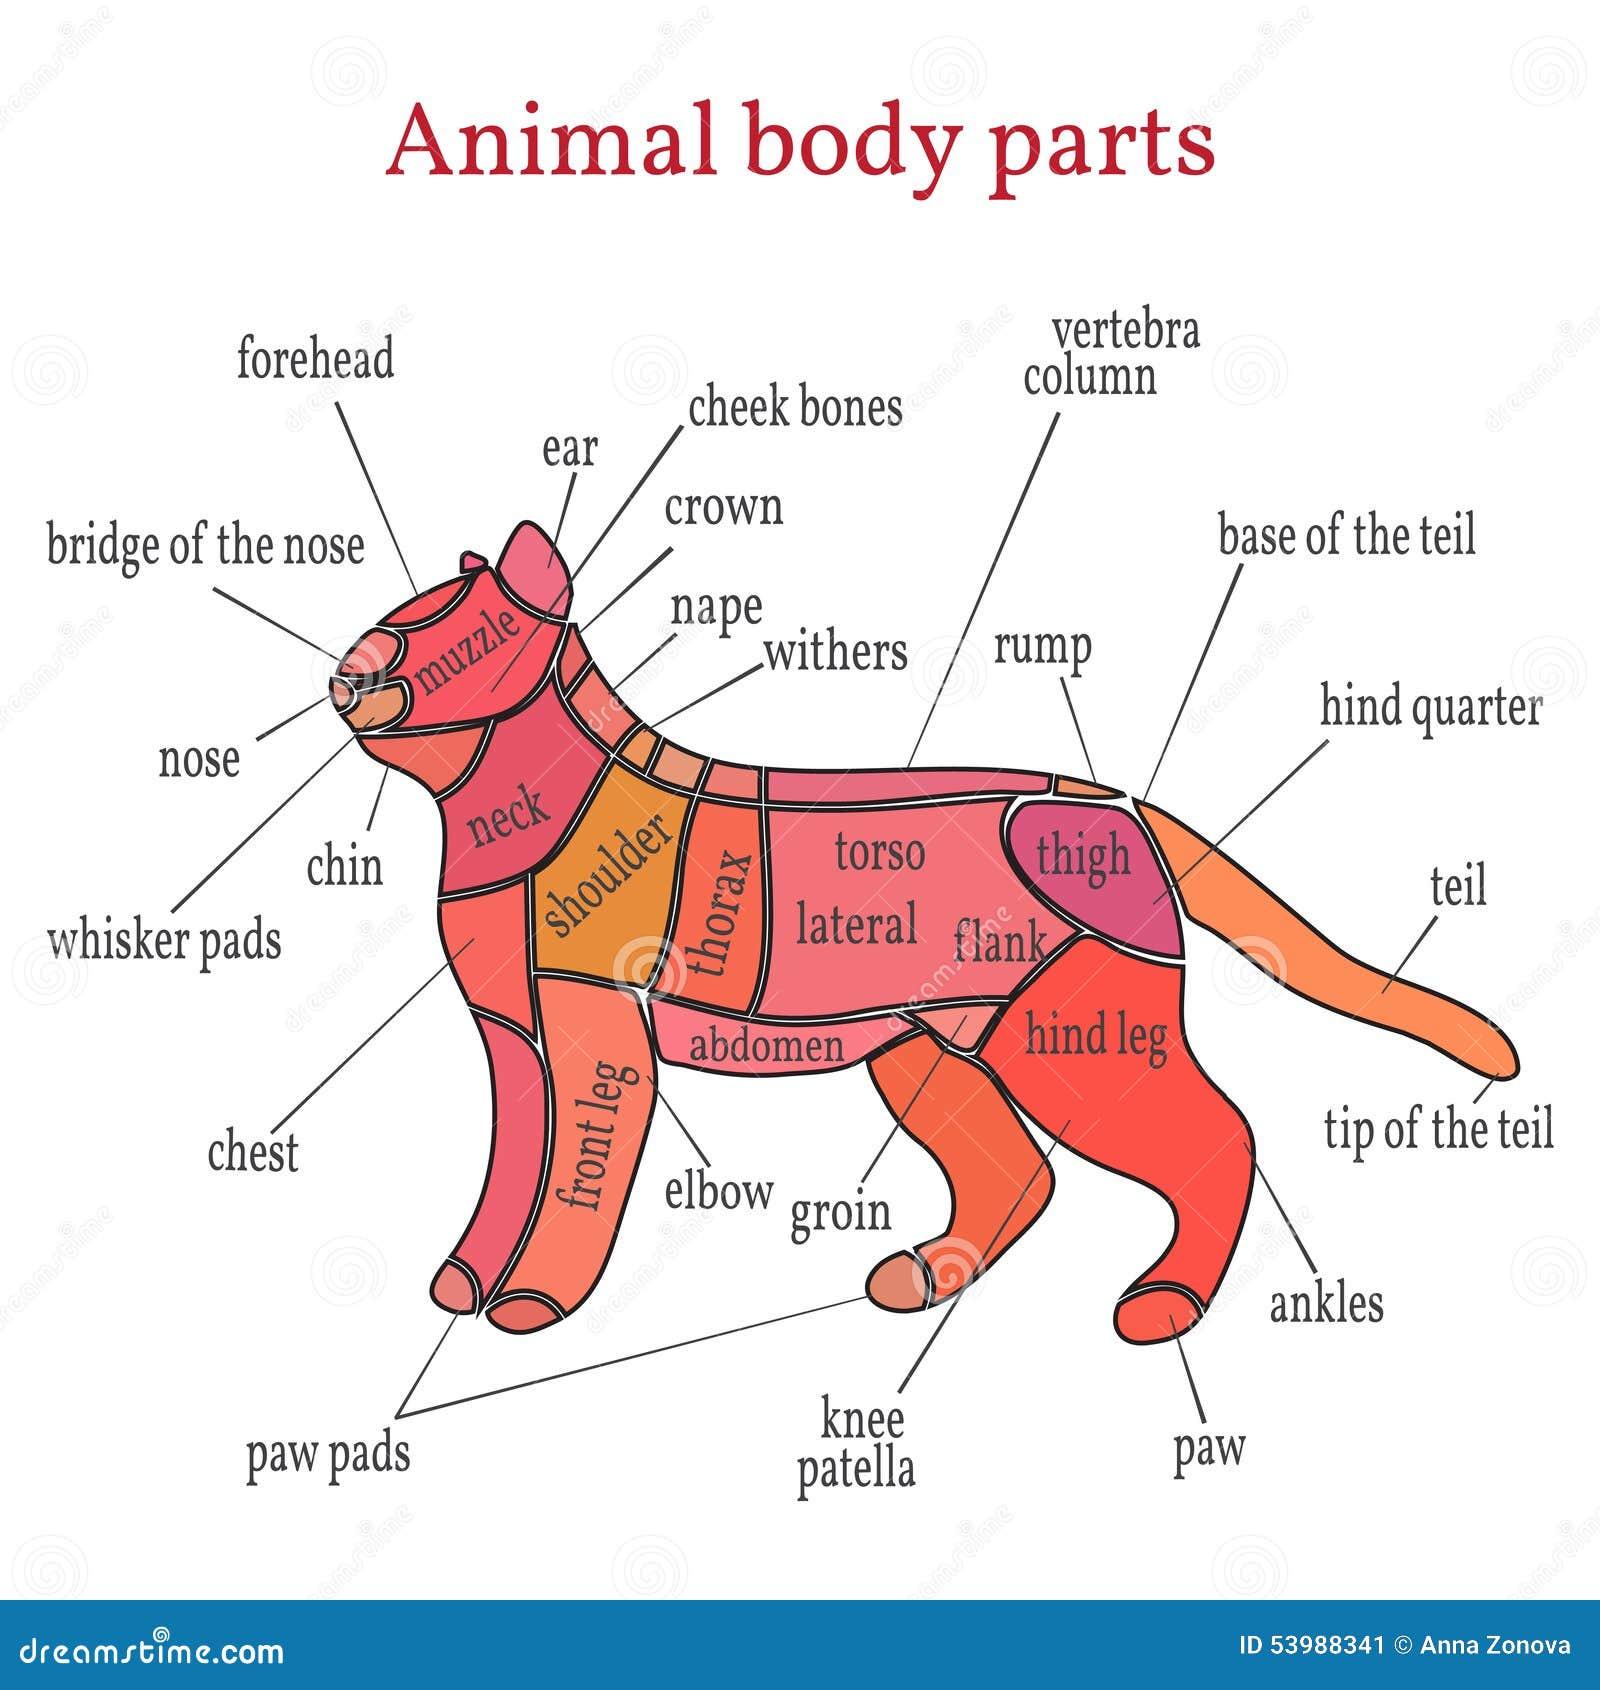 Animal Body Parts Vector Illustration on Ear Diagram Worksheet